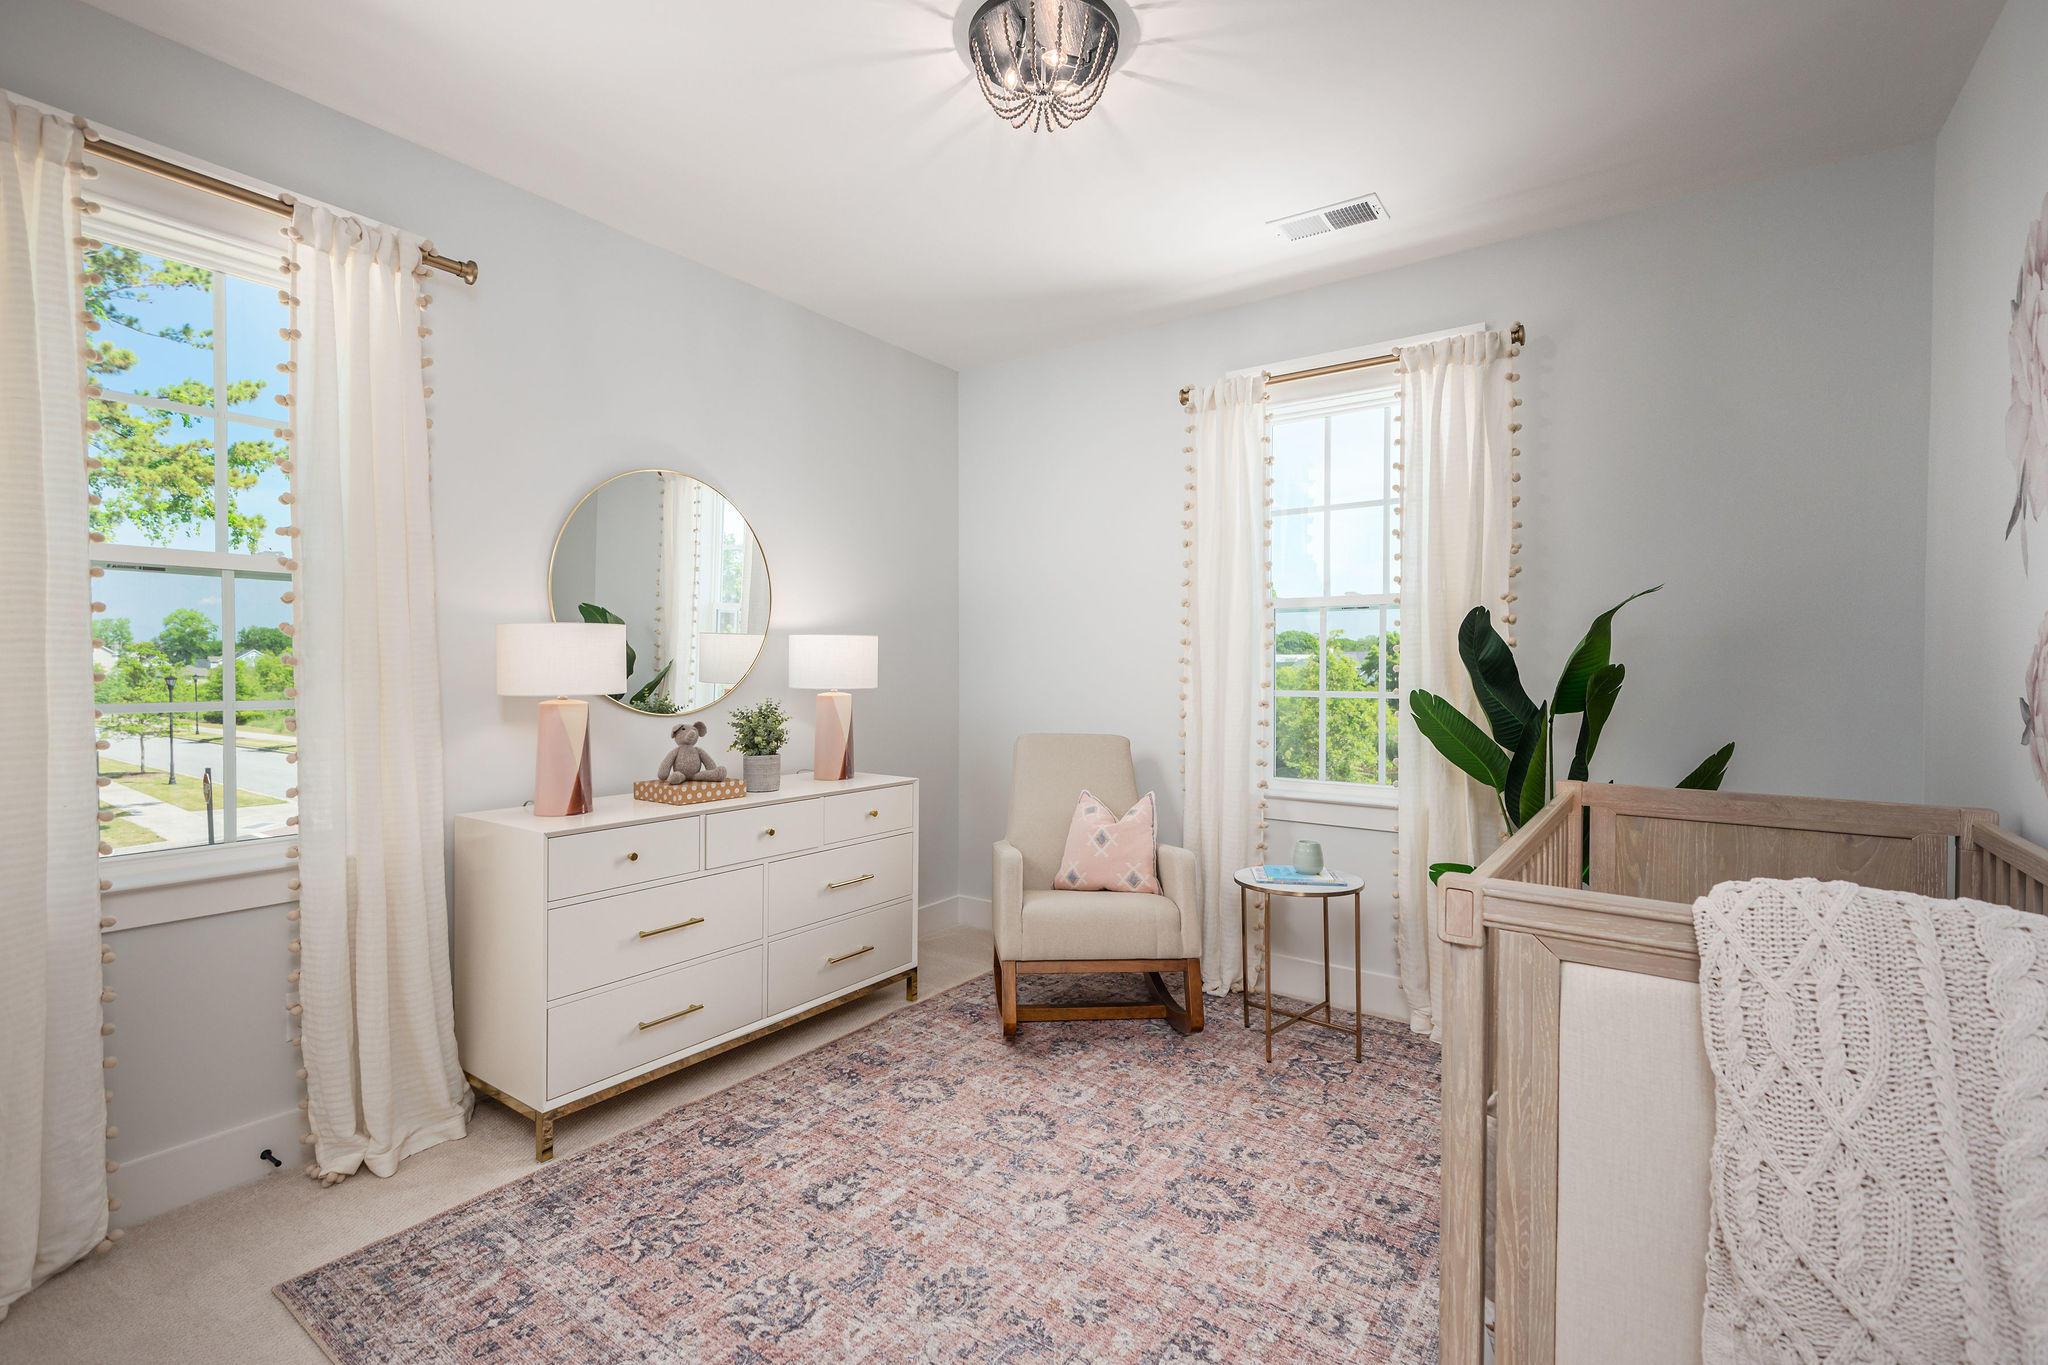 Midtown Homes For Sale - 1537 Kepley, Mount Pleasant, SC - 11